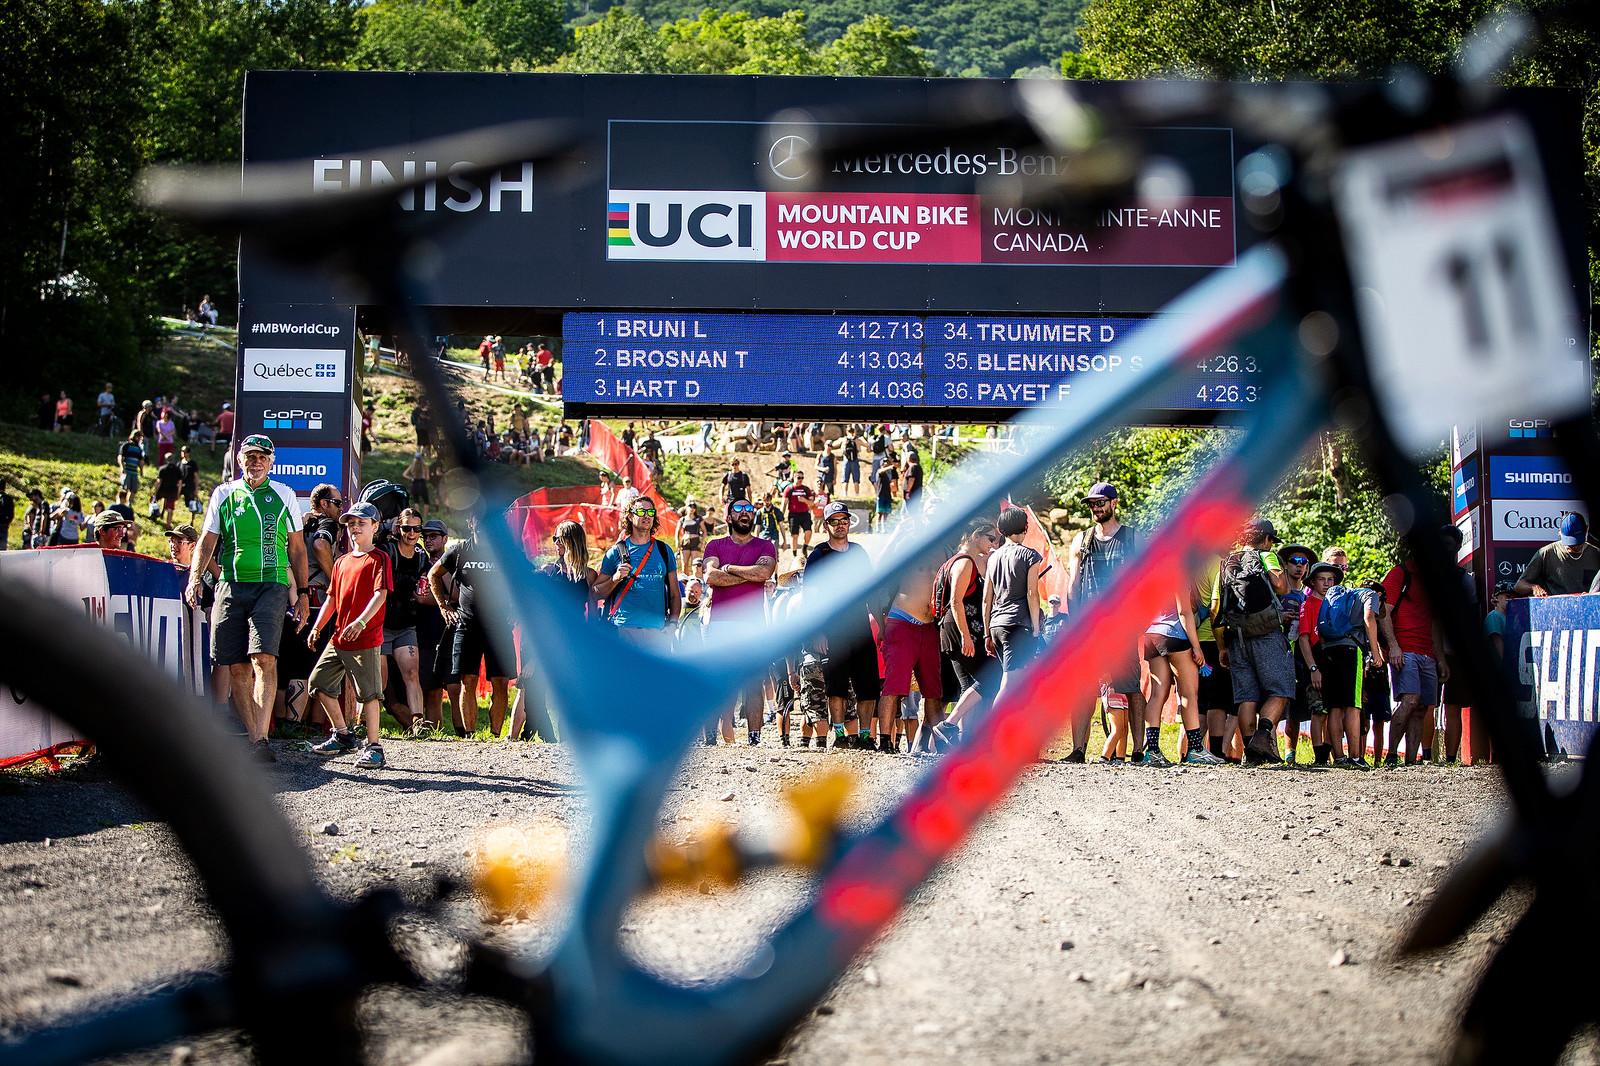 WINNING BIKE: Loic Bruni's Specialized Demo at Mont-Sainte-Anne - MSA 2018 Winning Bike: Loic Bruni's Specialized Demo - Mountain Biking Pictures - Vital MTB